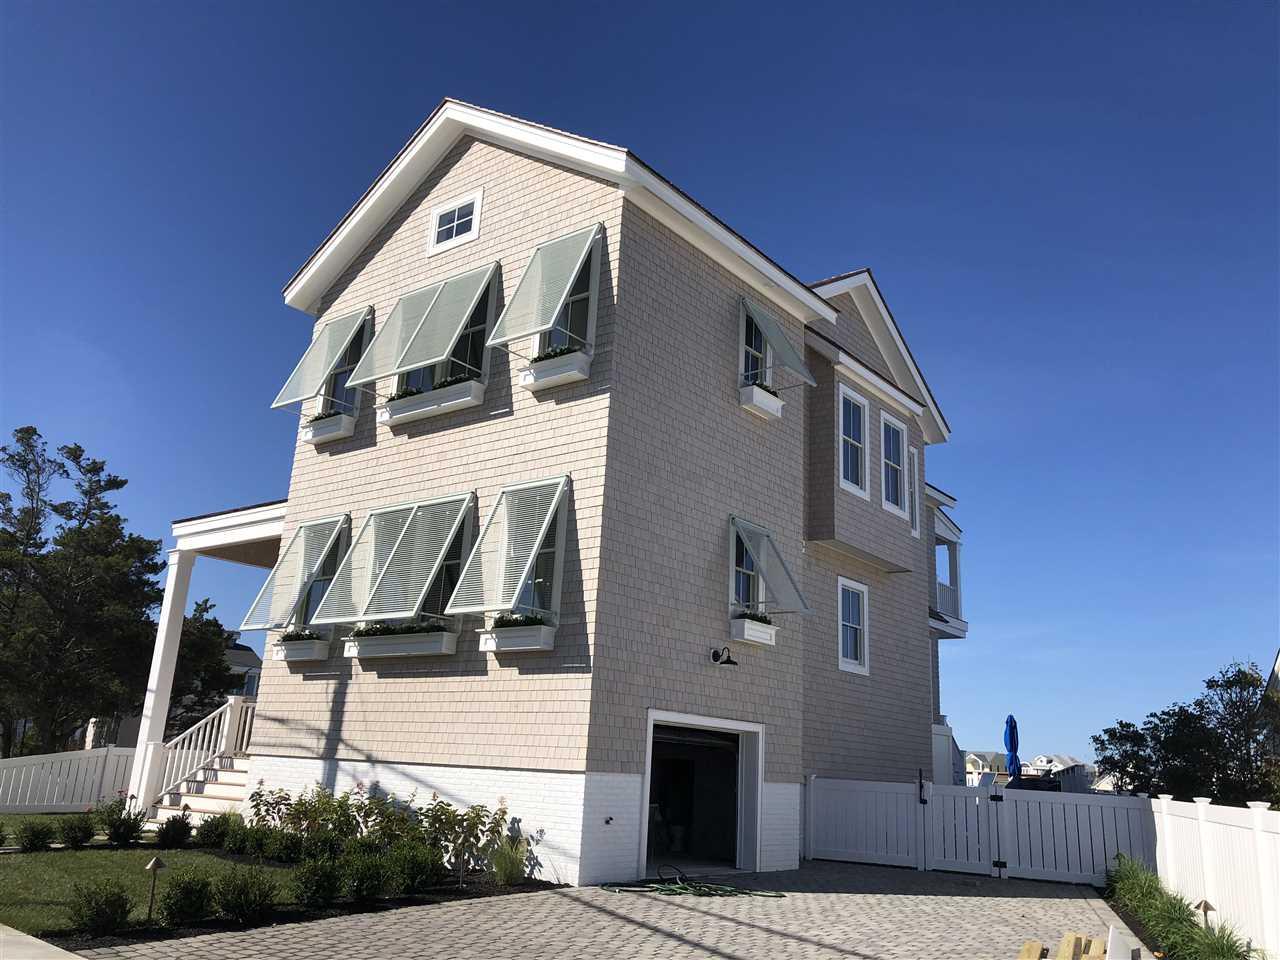 10403 Third Ave Avenue, Stone Harbor,NJ - Picture 2